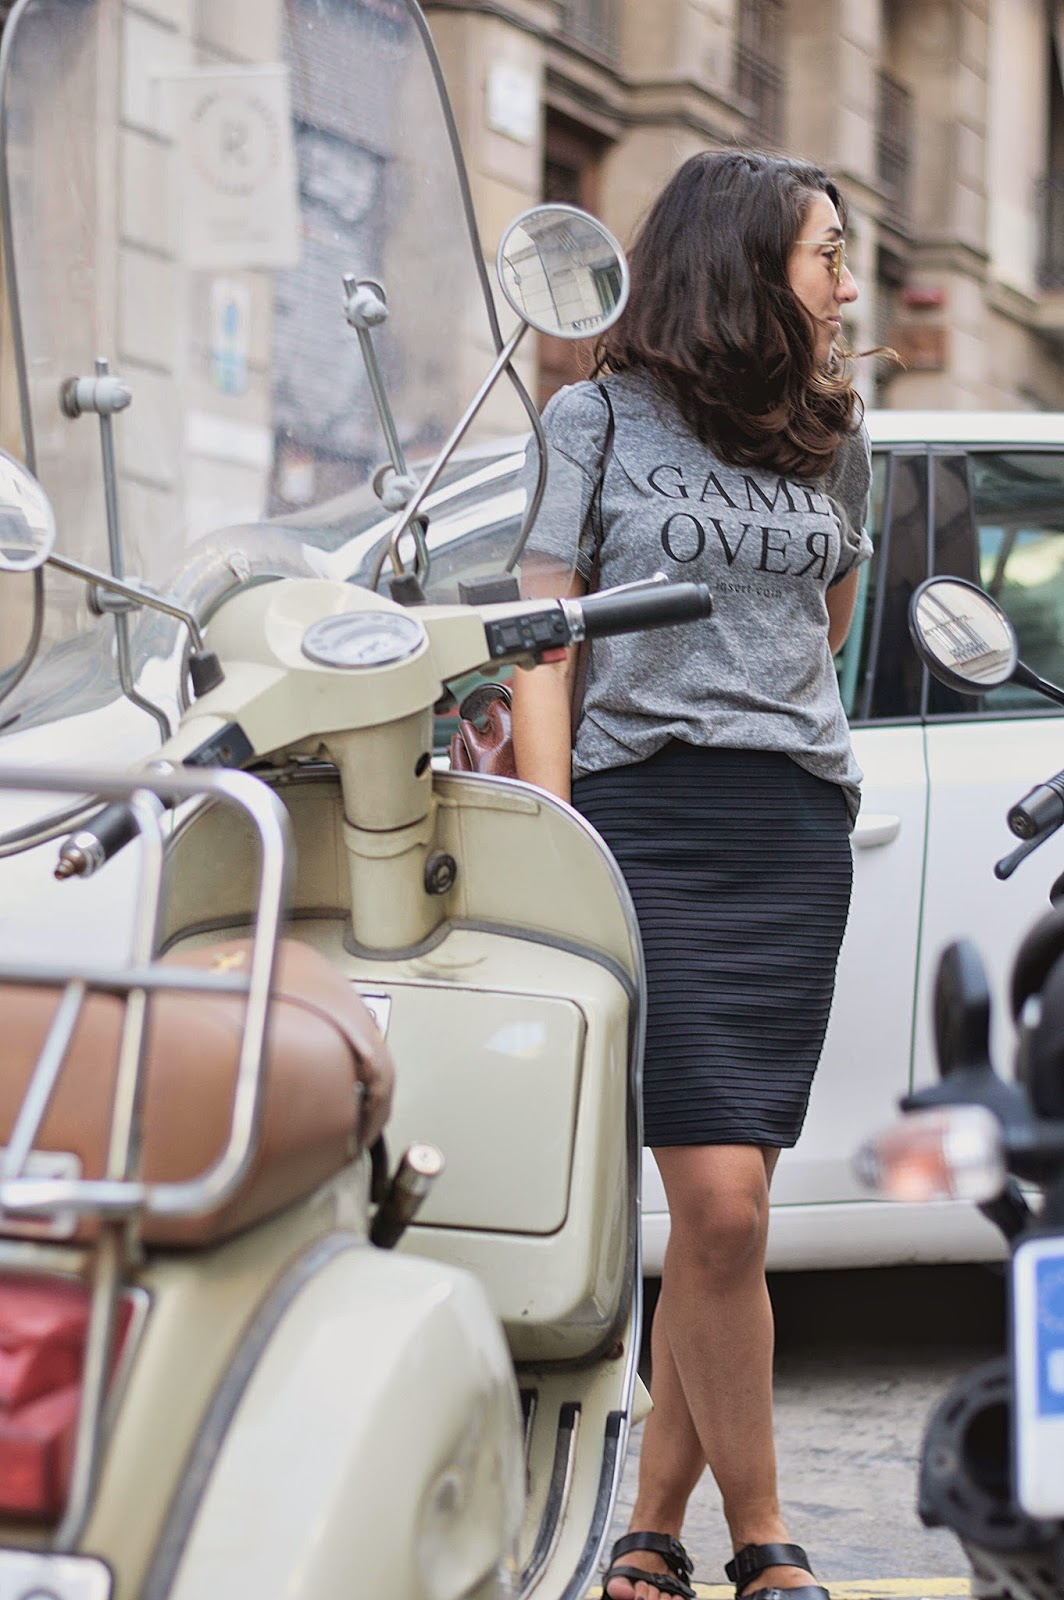 camiseta bershka Game Over, falda Mango, bolso vintage, sandalias Sommers